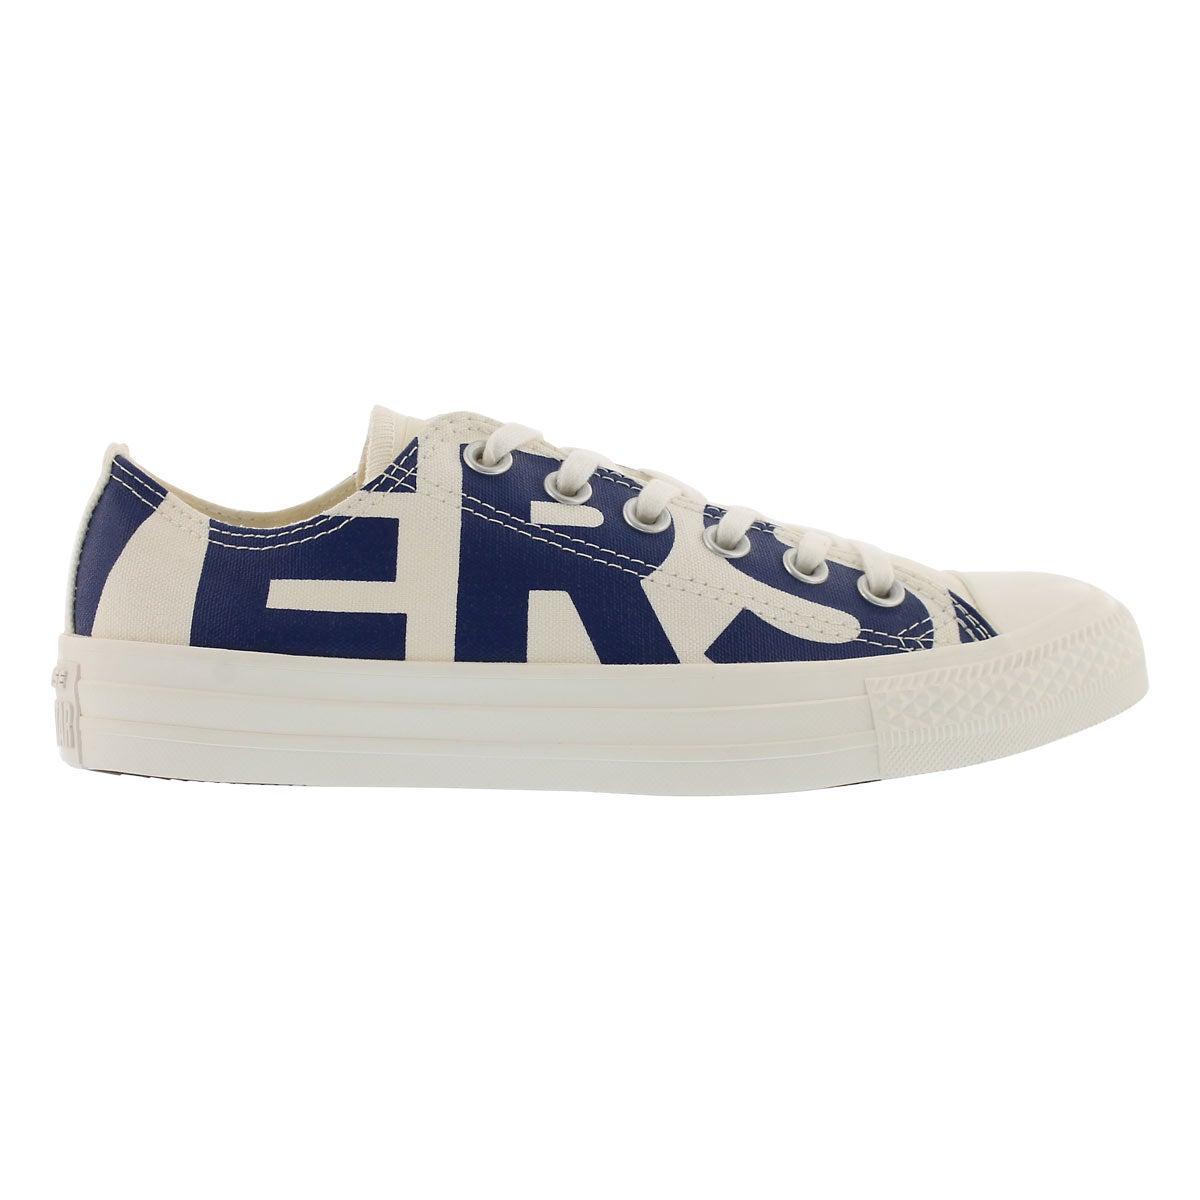 Lds CTAS Wordmark wht/nvy sneaker